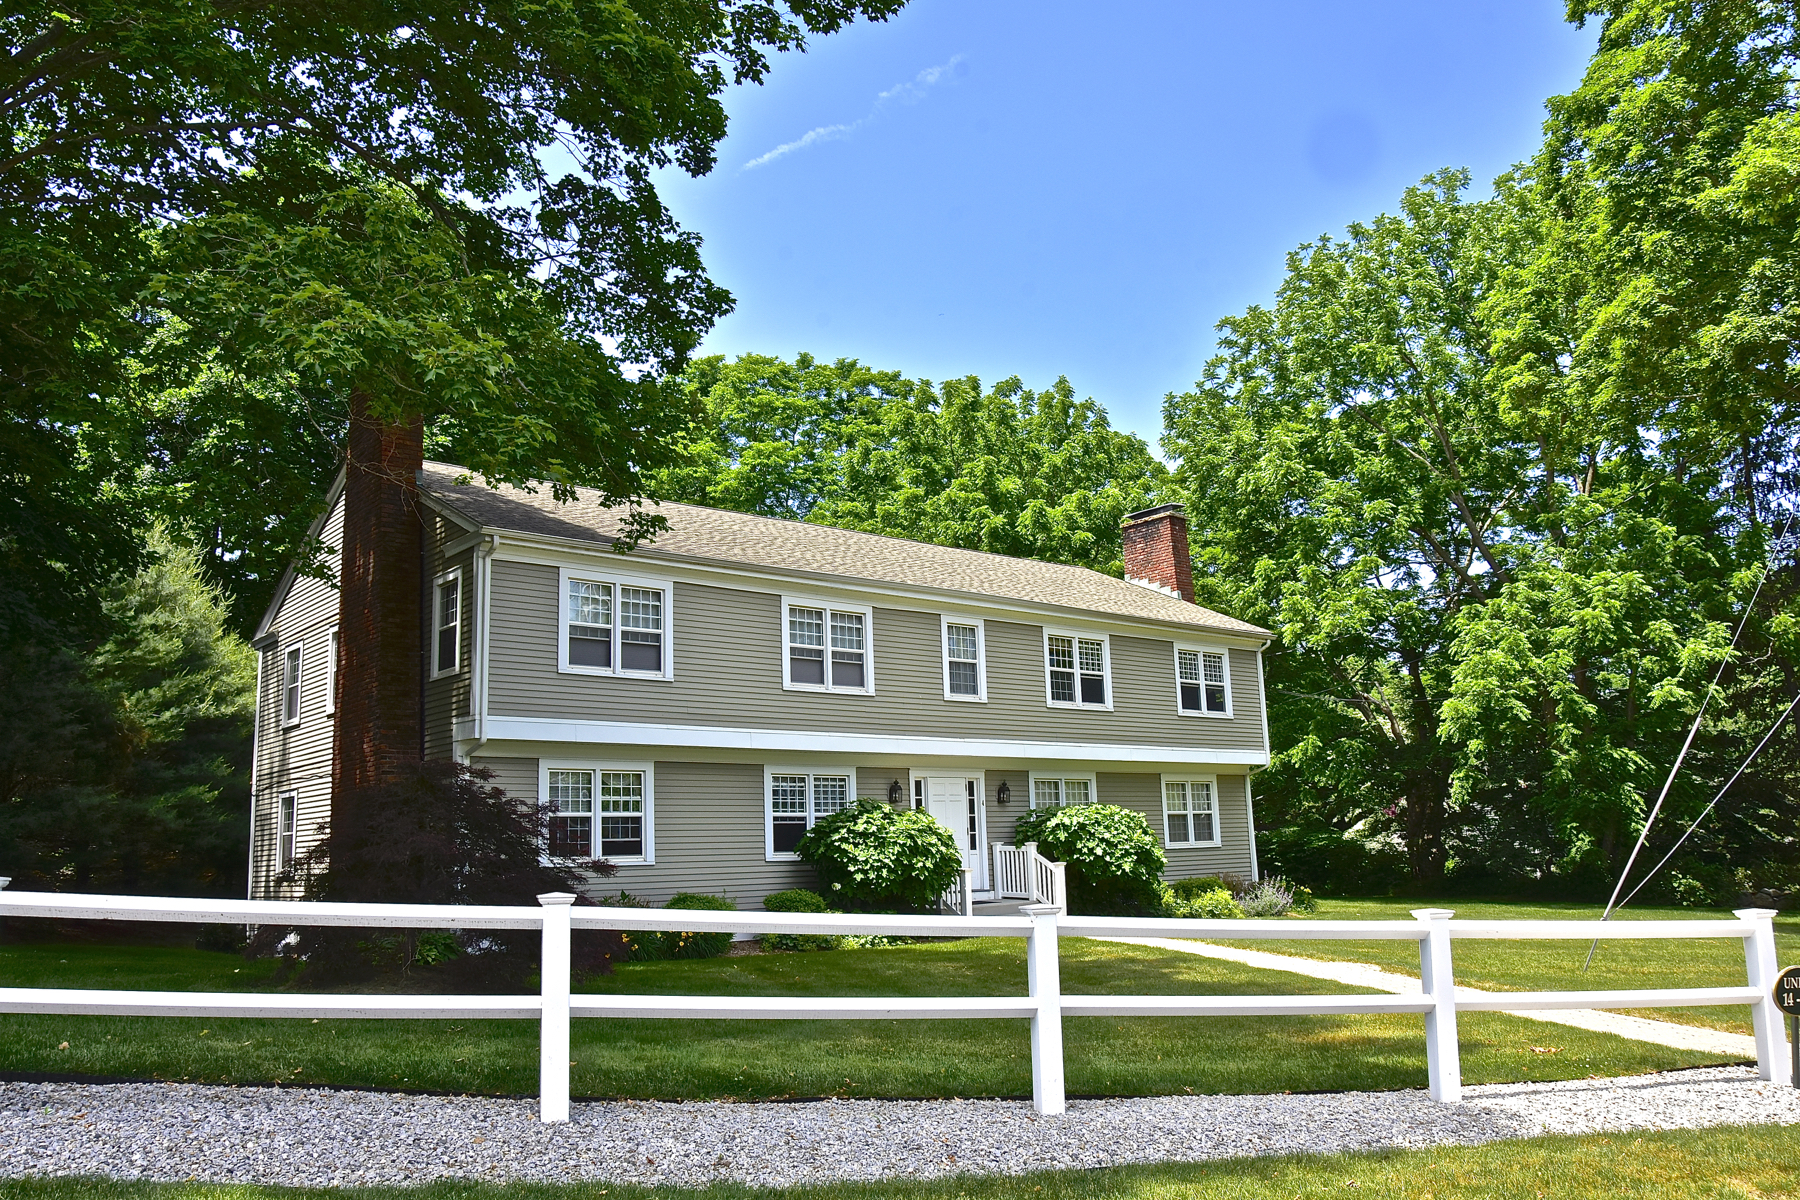 Nhà chung cư vì Bán tại Wonderful Essex Village Condo 38 North Main St 16 Essex, Connecticut, 06426 Hoa Kỳ